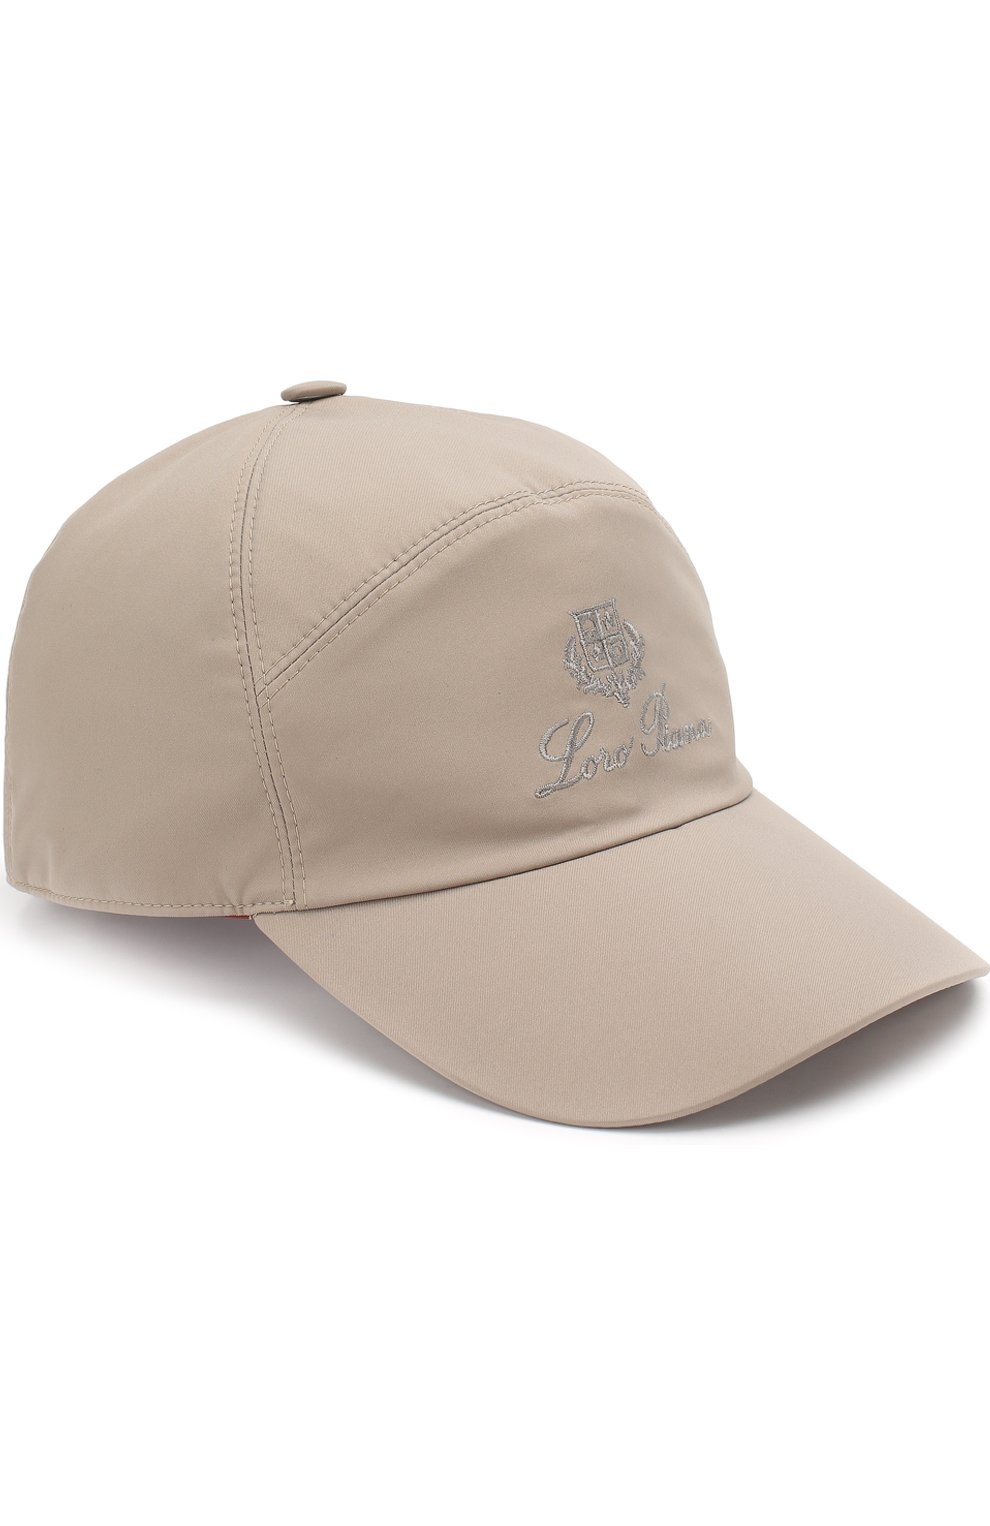 Мужской бейсболка с логотипом бренда LORO PIANA бежевого цвета, арт. FAF8517 | Фото 1